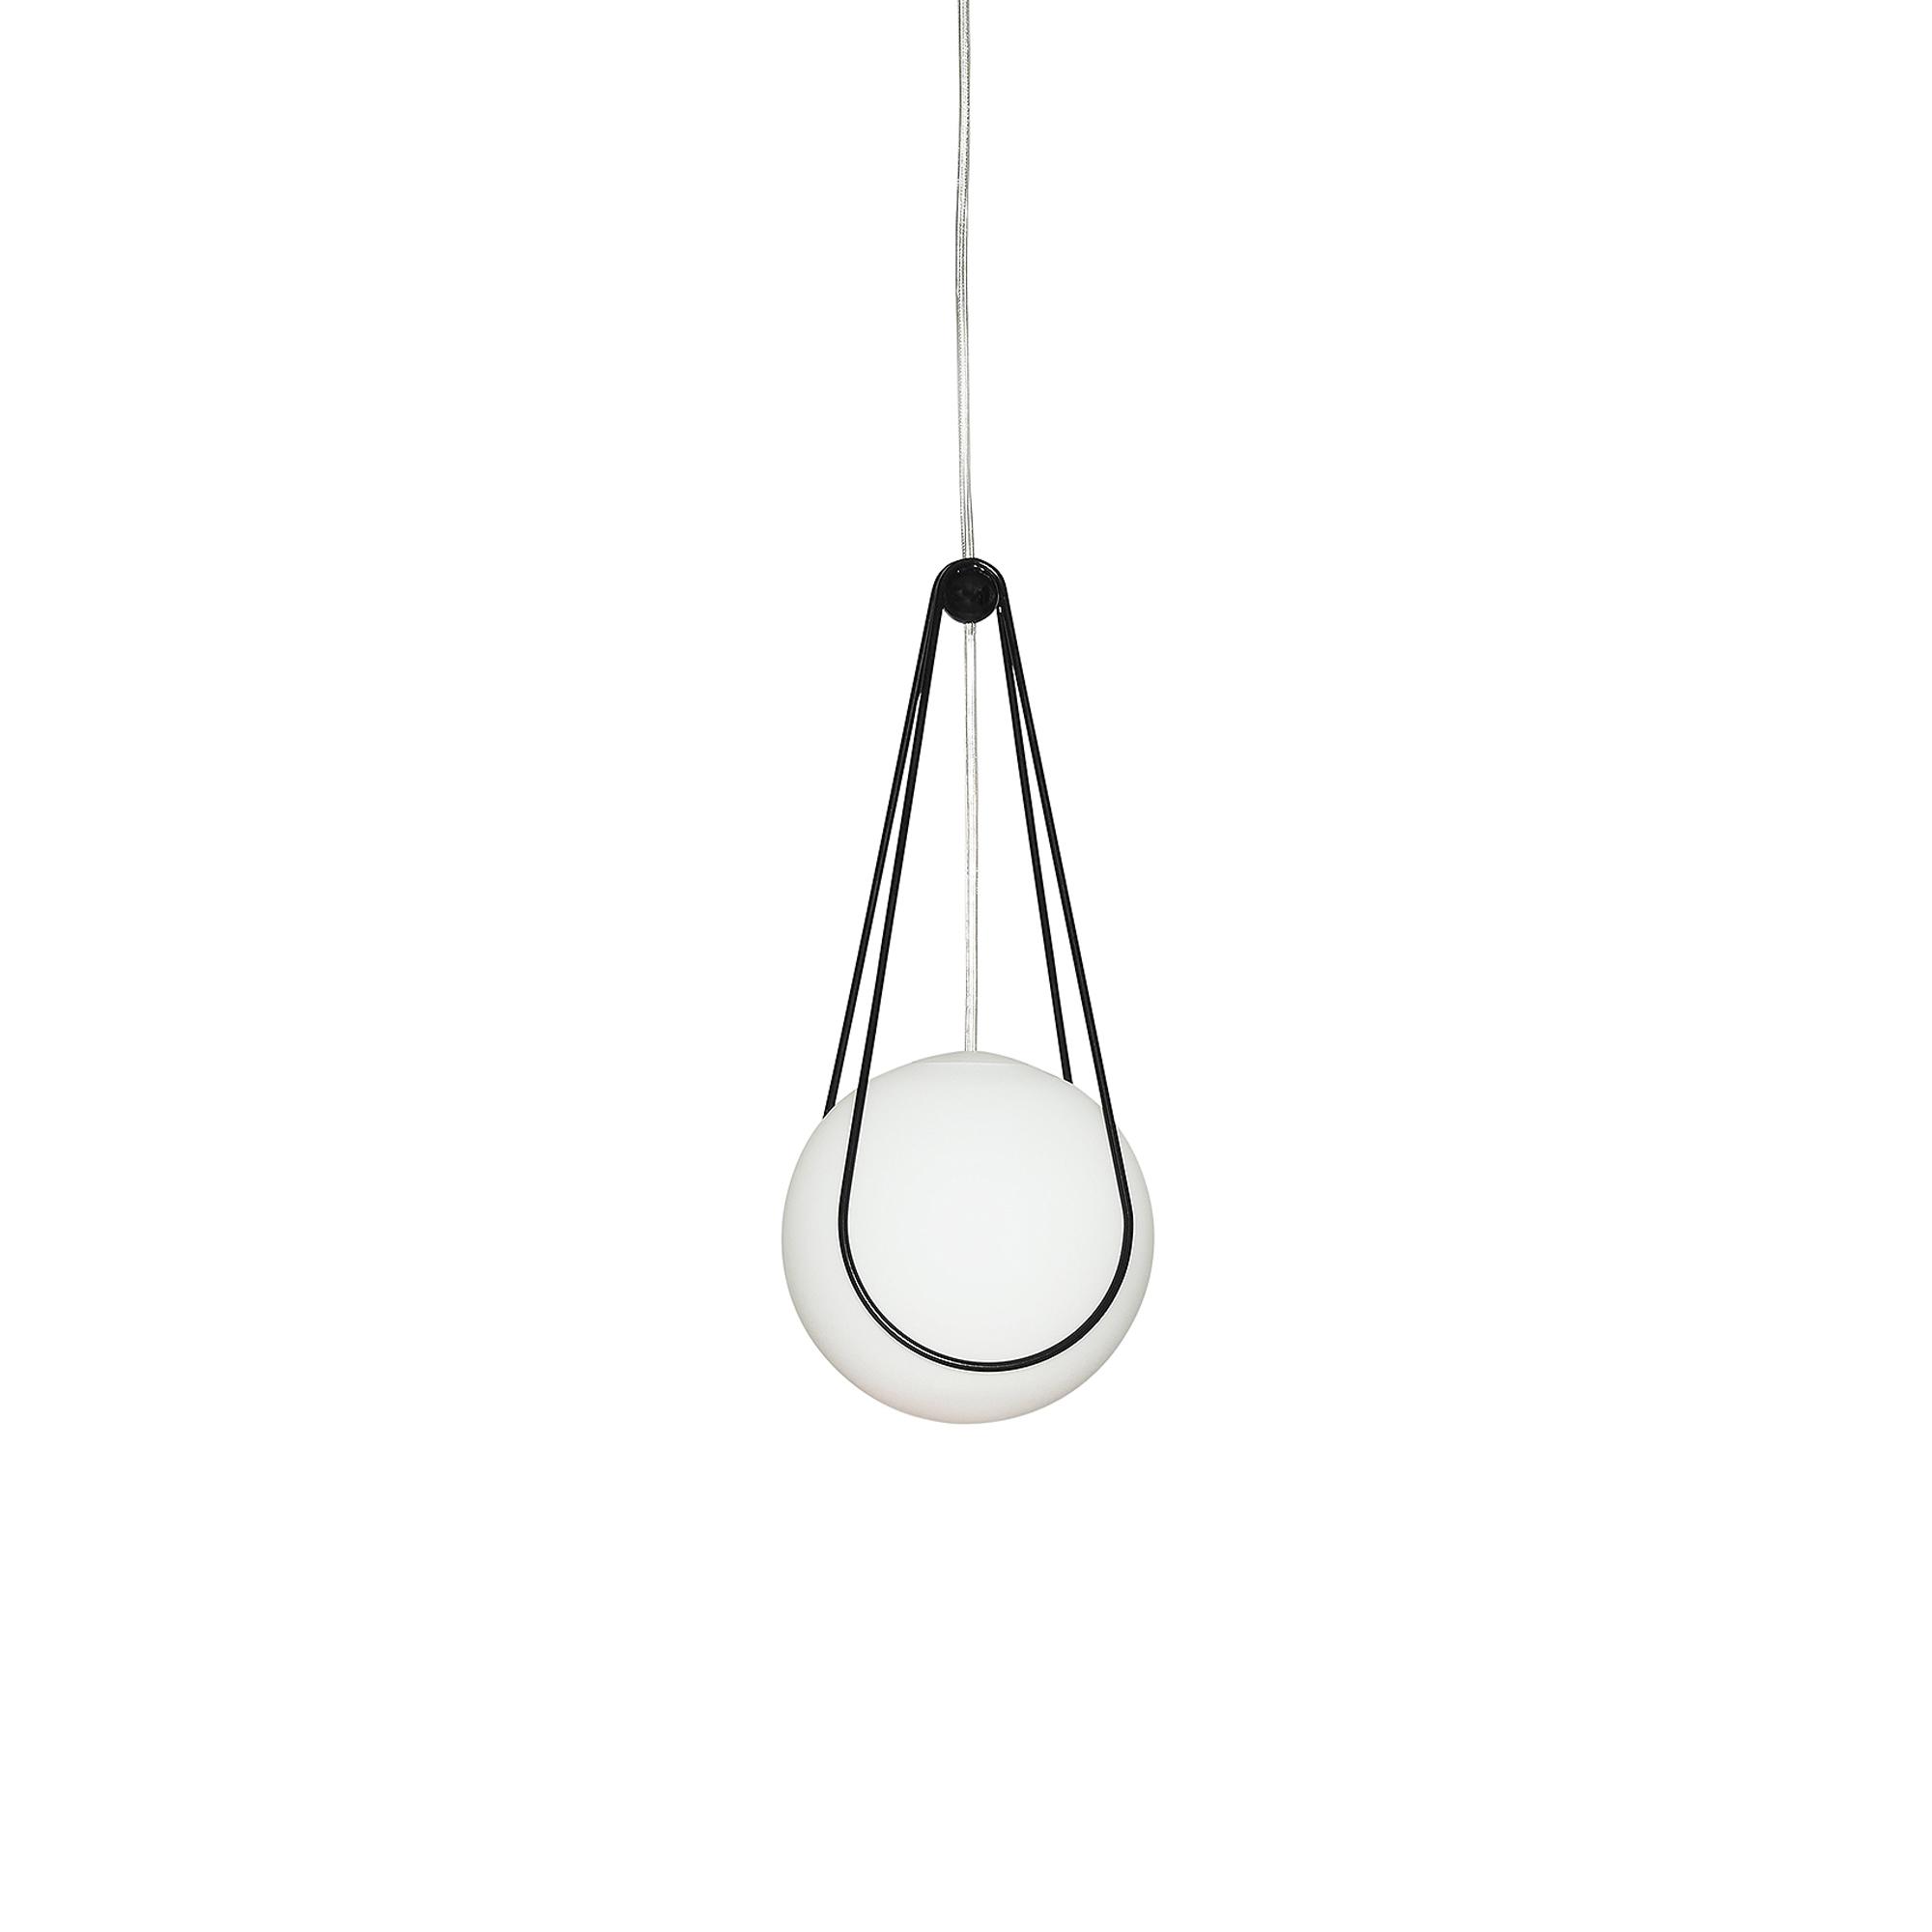 Design House Stockholm Lamphållare Kosmos 160mm svart